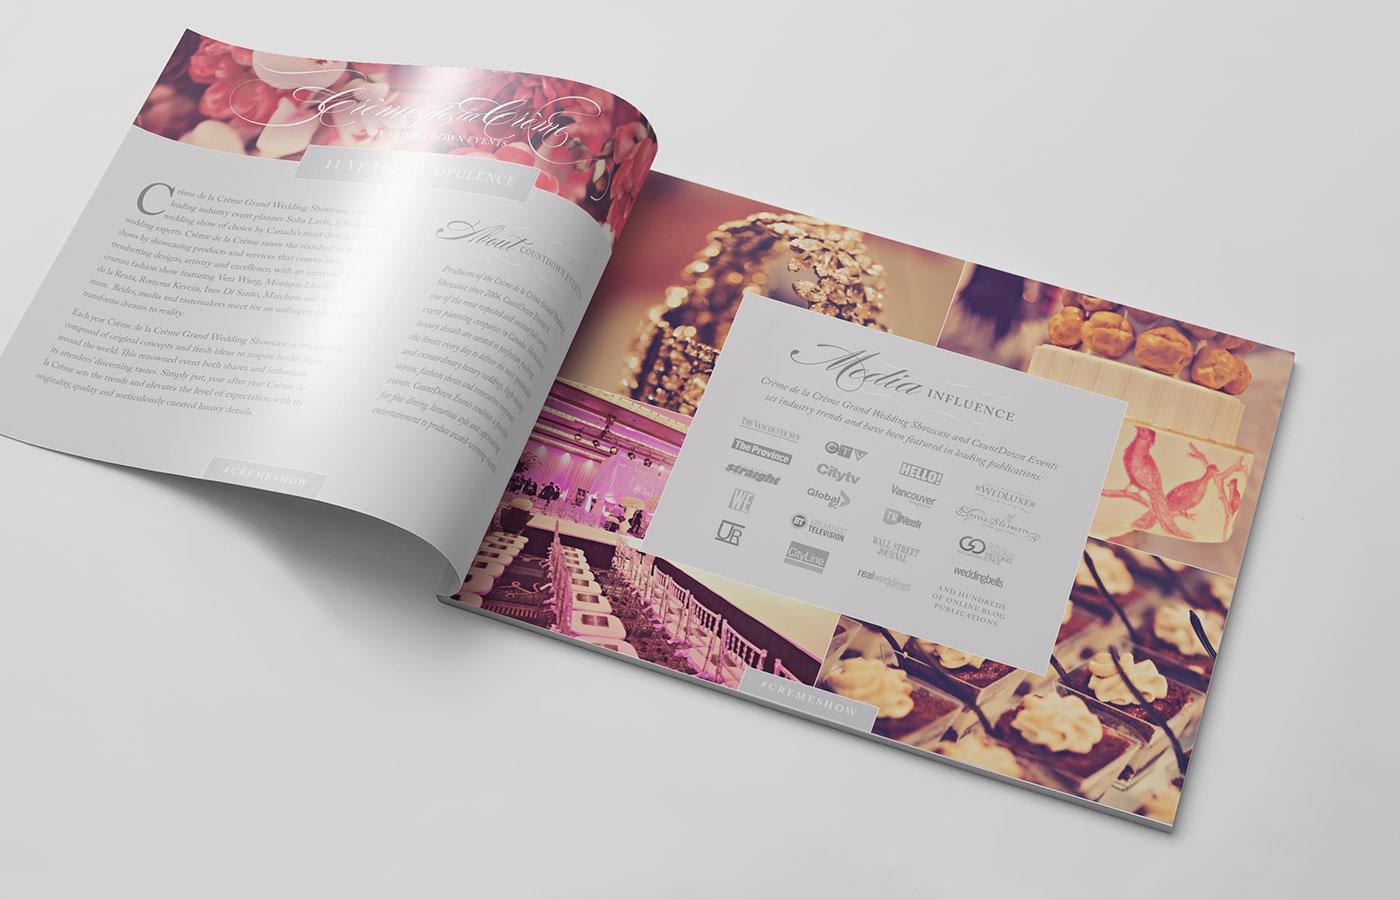 covetdesign_logo-design_branding_package-design_graphic-designer_vancouver_work_wide_countdown-5